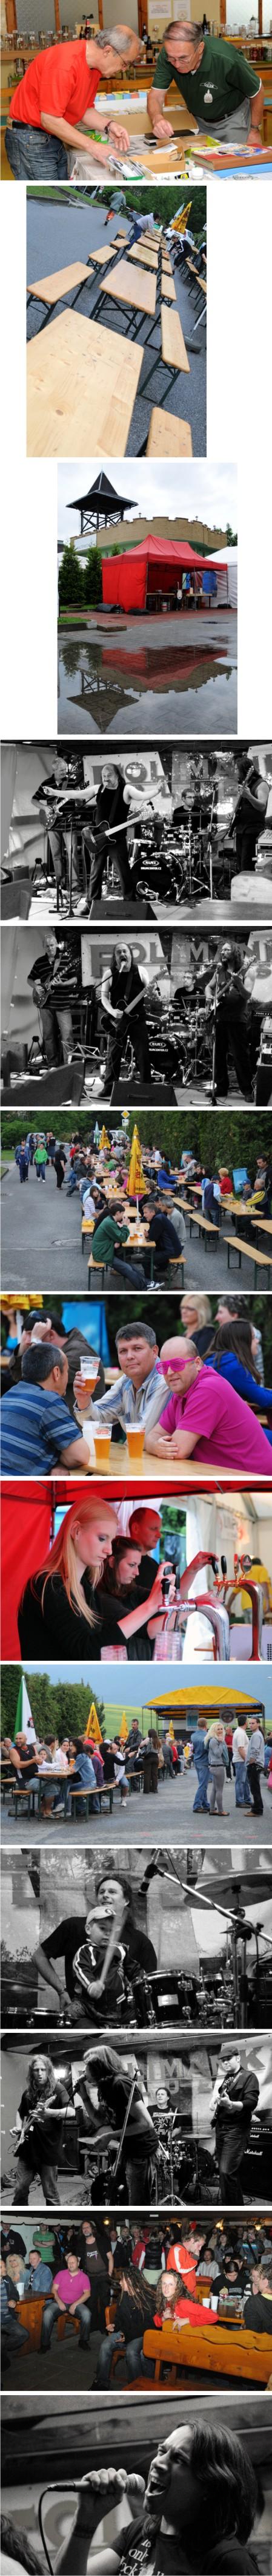 Pivné slávnosti v Rožňave